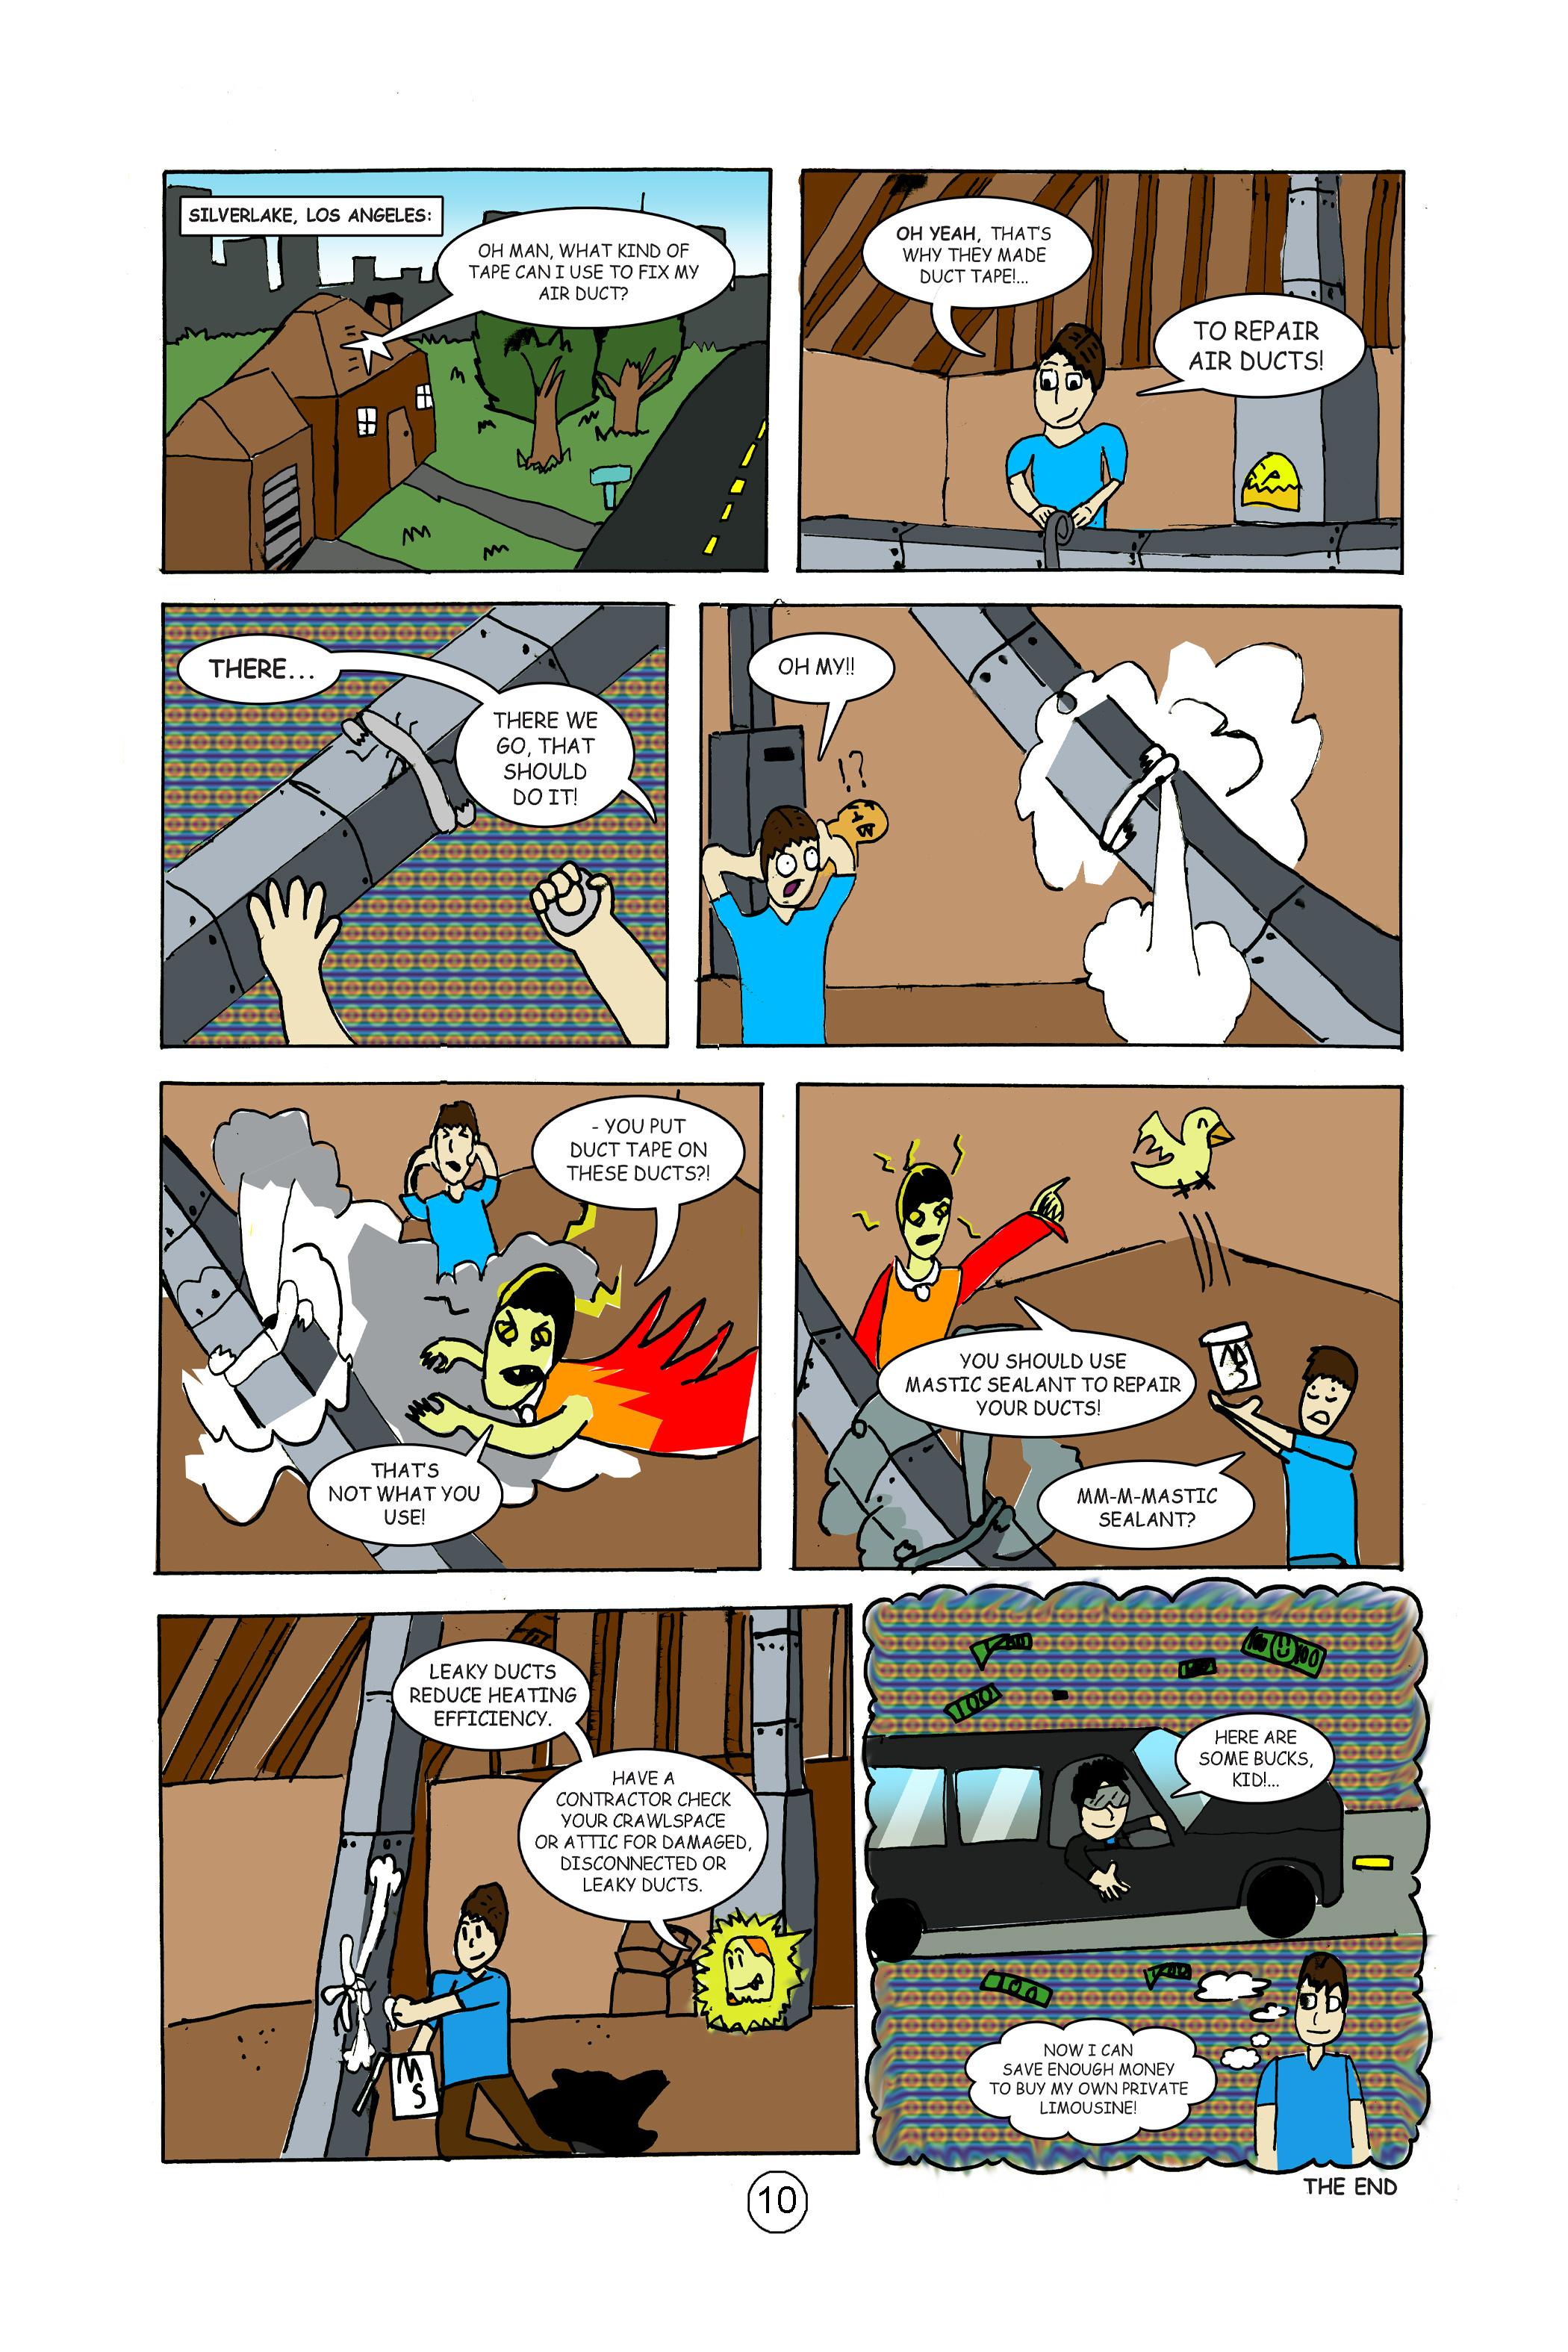 EVWP-Comic-Page-10.jpg